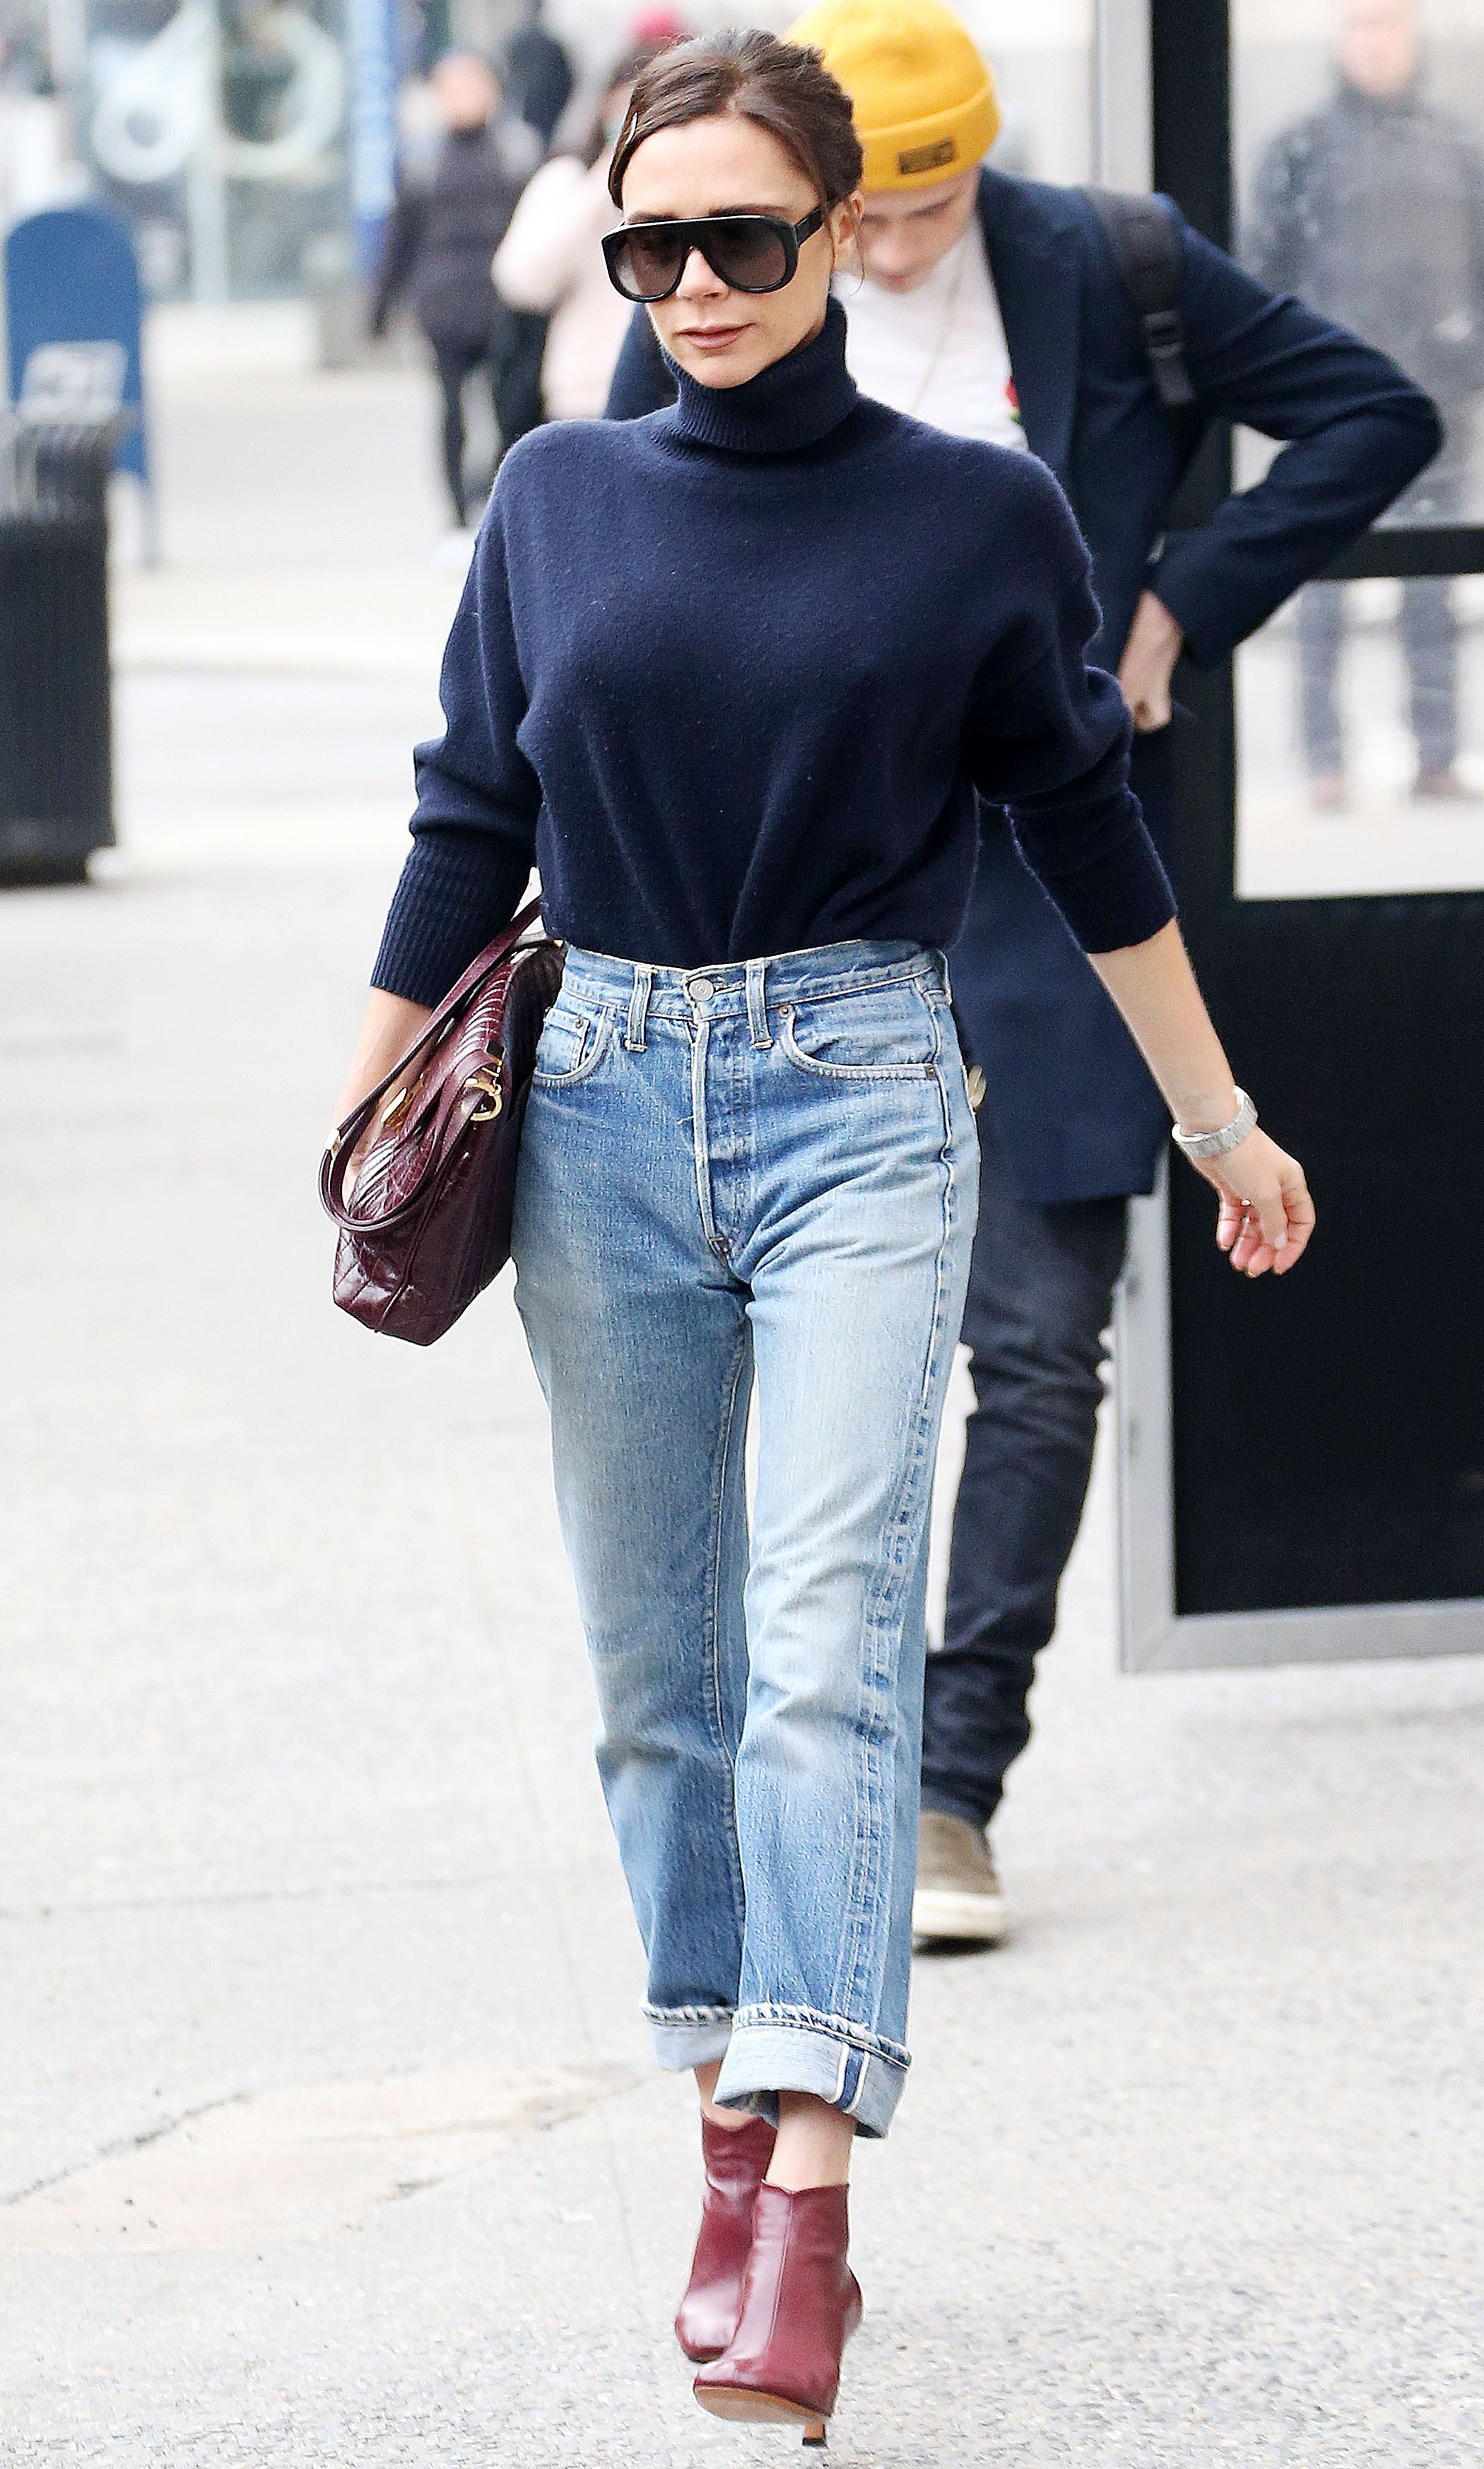 Fashion Week de New York : Rosie Huntington-Whiteley, Victoria Beckham, Kendall Jenner... Battle de fashionistas !